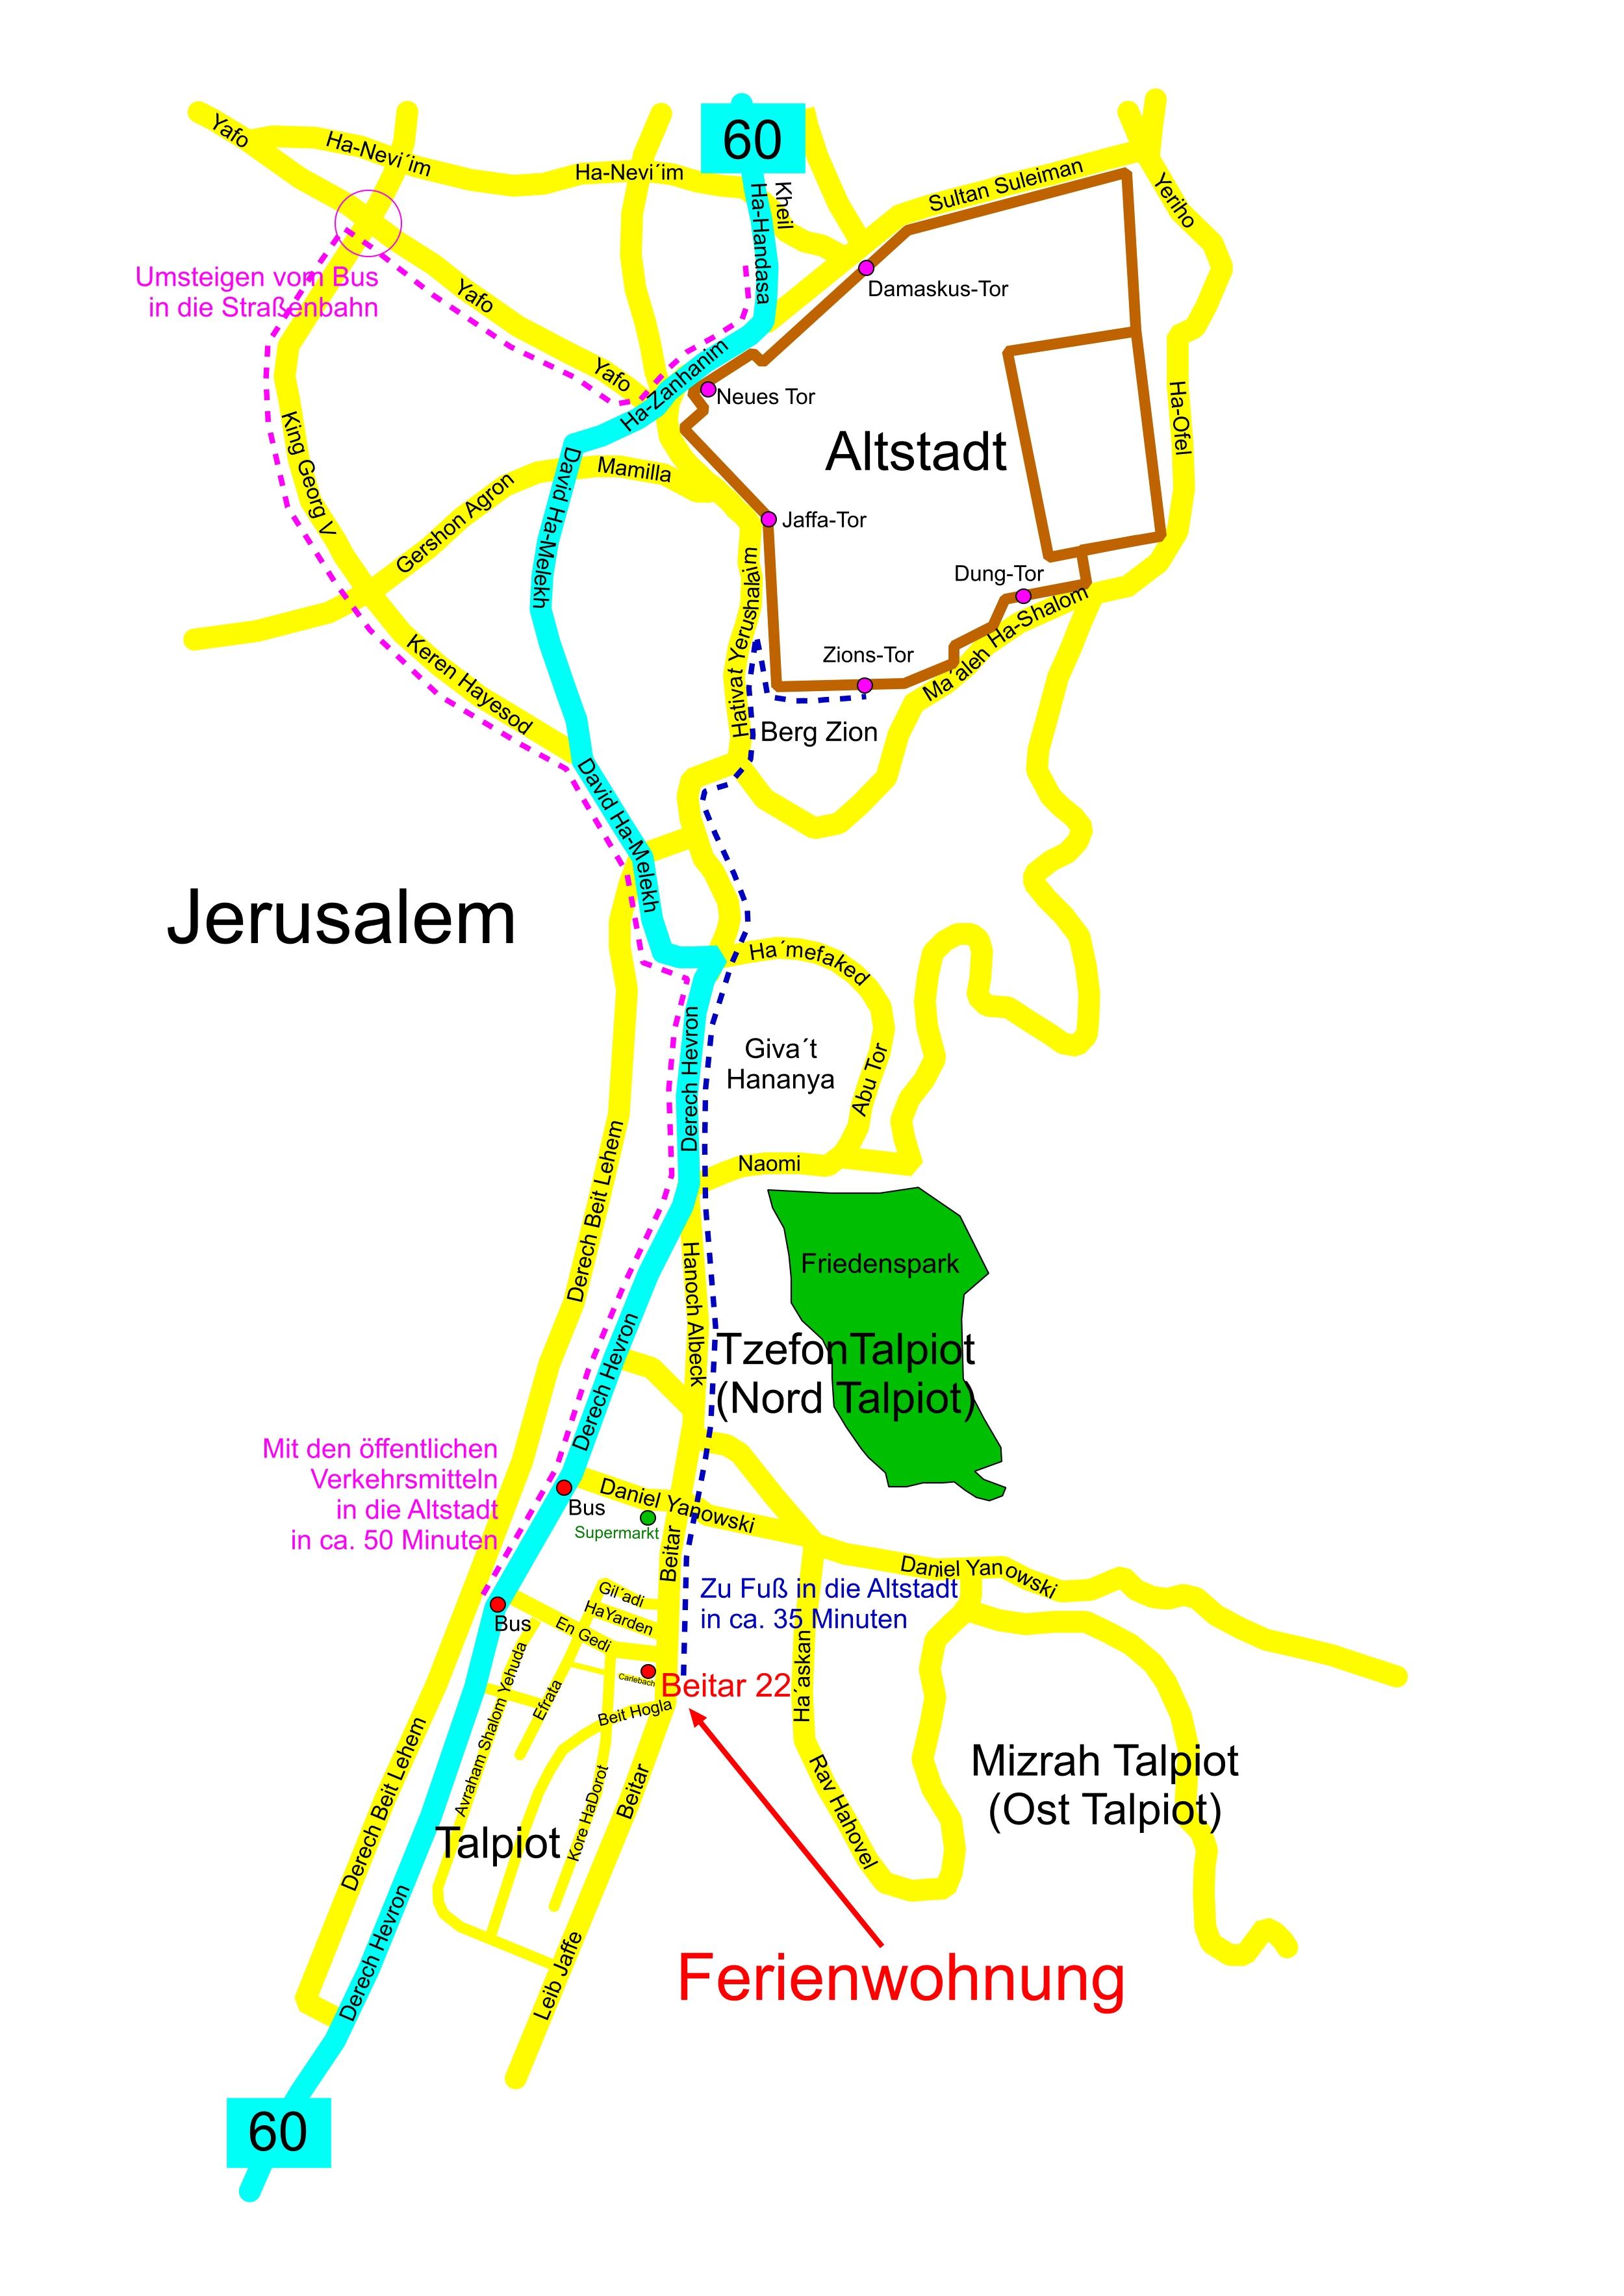 Jerusalem Karte Deutsch.Sehenswürdigkeiten In Jerusalem Altstadt Bilderserie Fotos Dsl